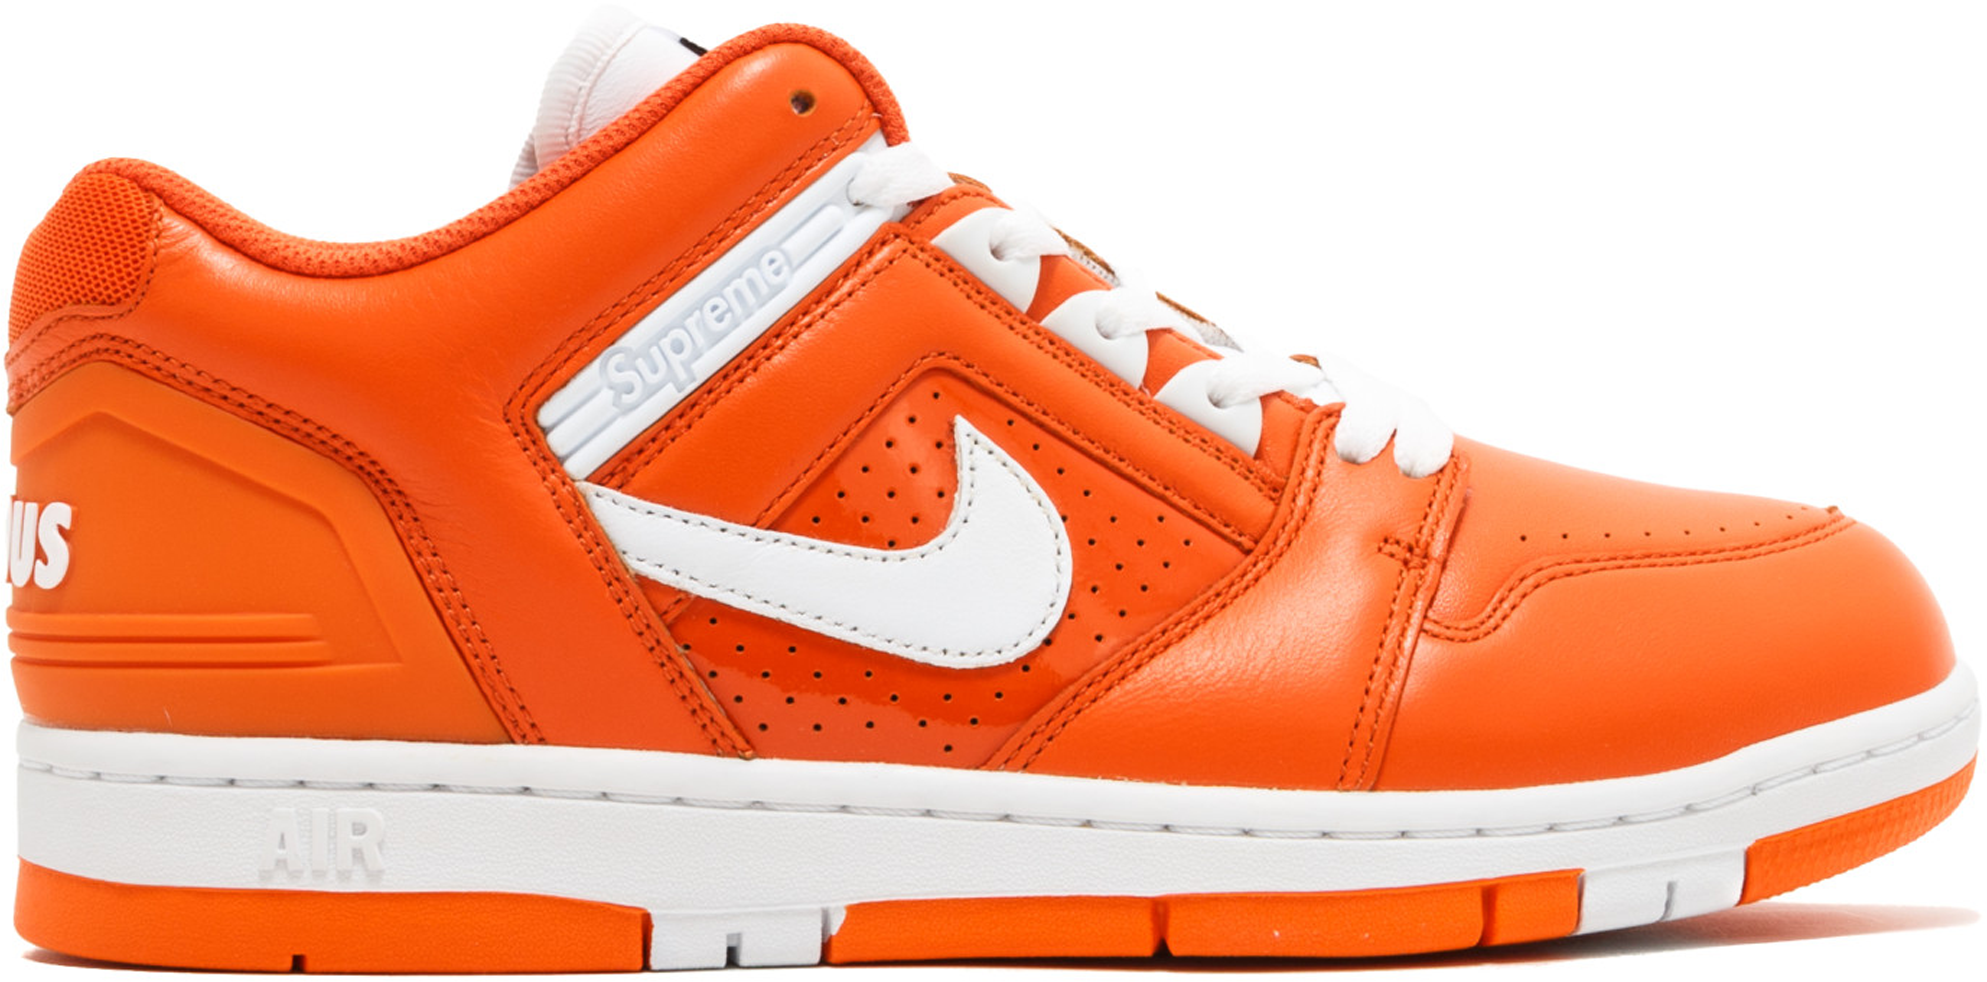 Nike SB Air Force 2 Low Supreme Orange